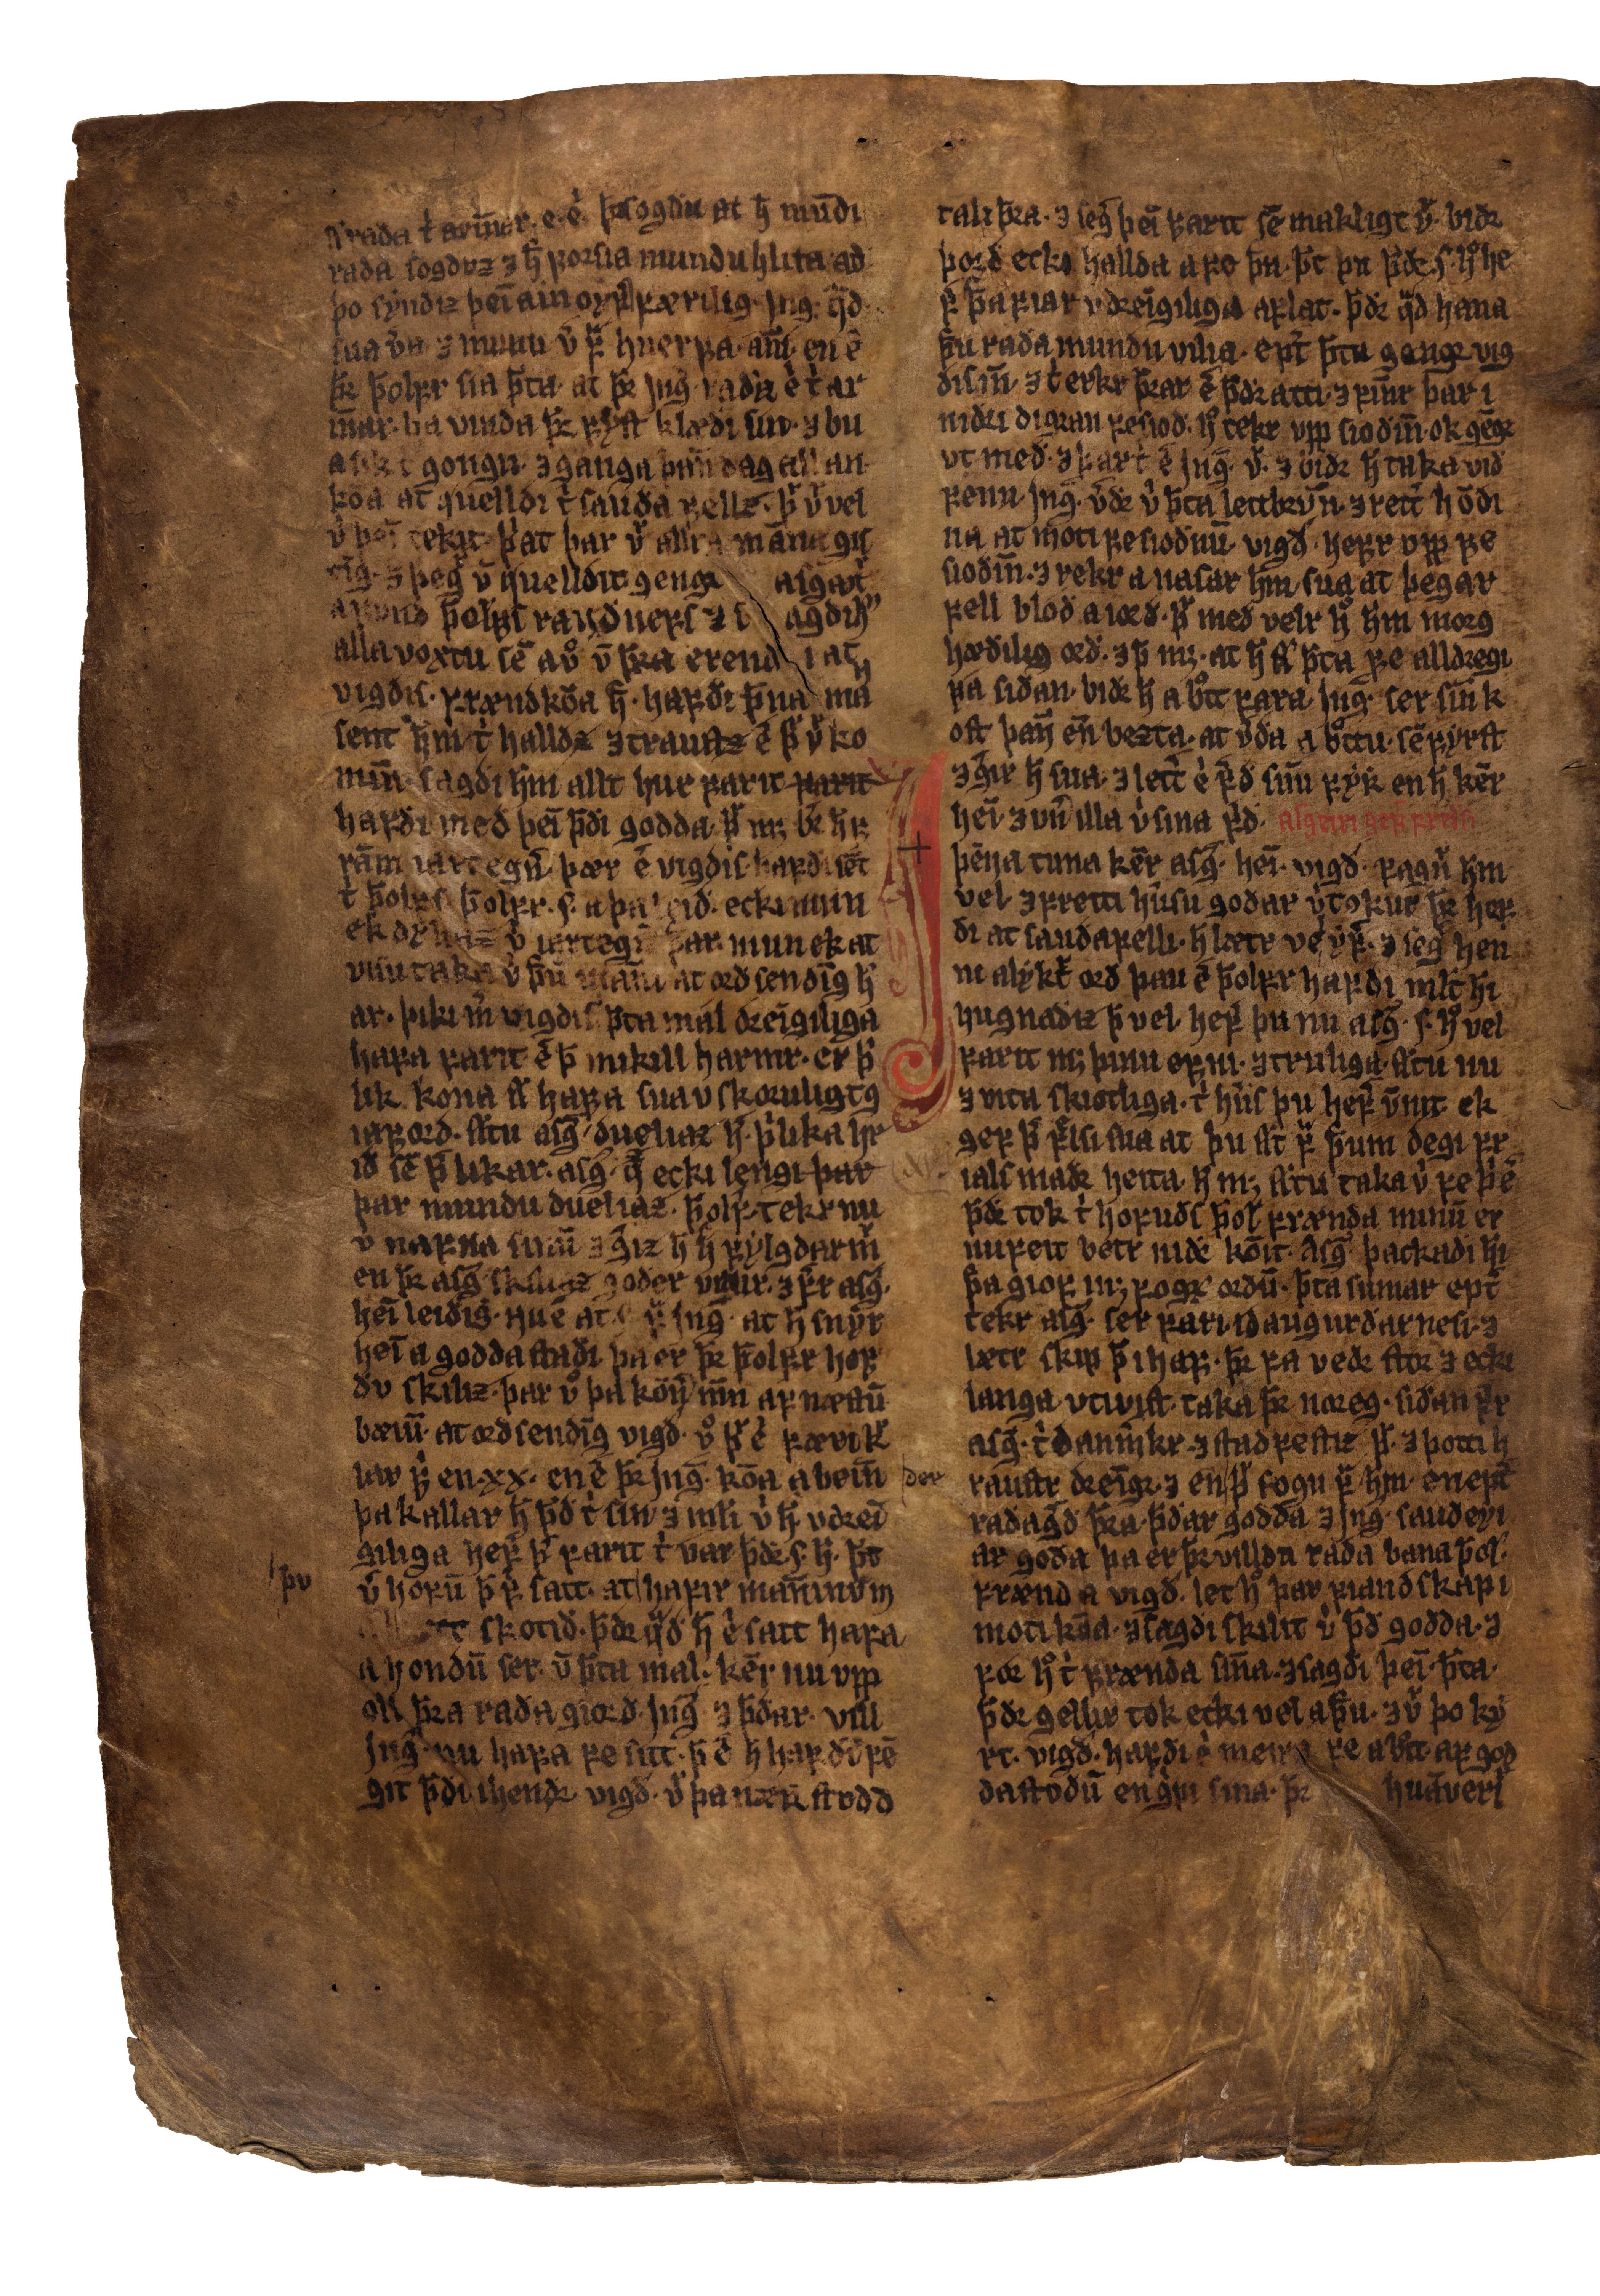 AM 132 fol - 161v